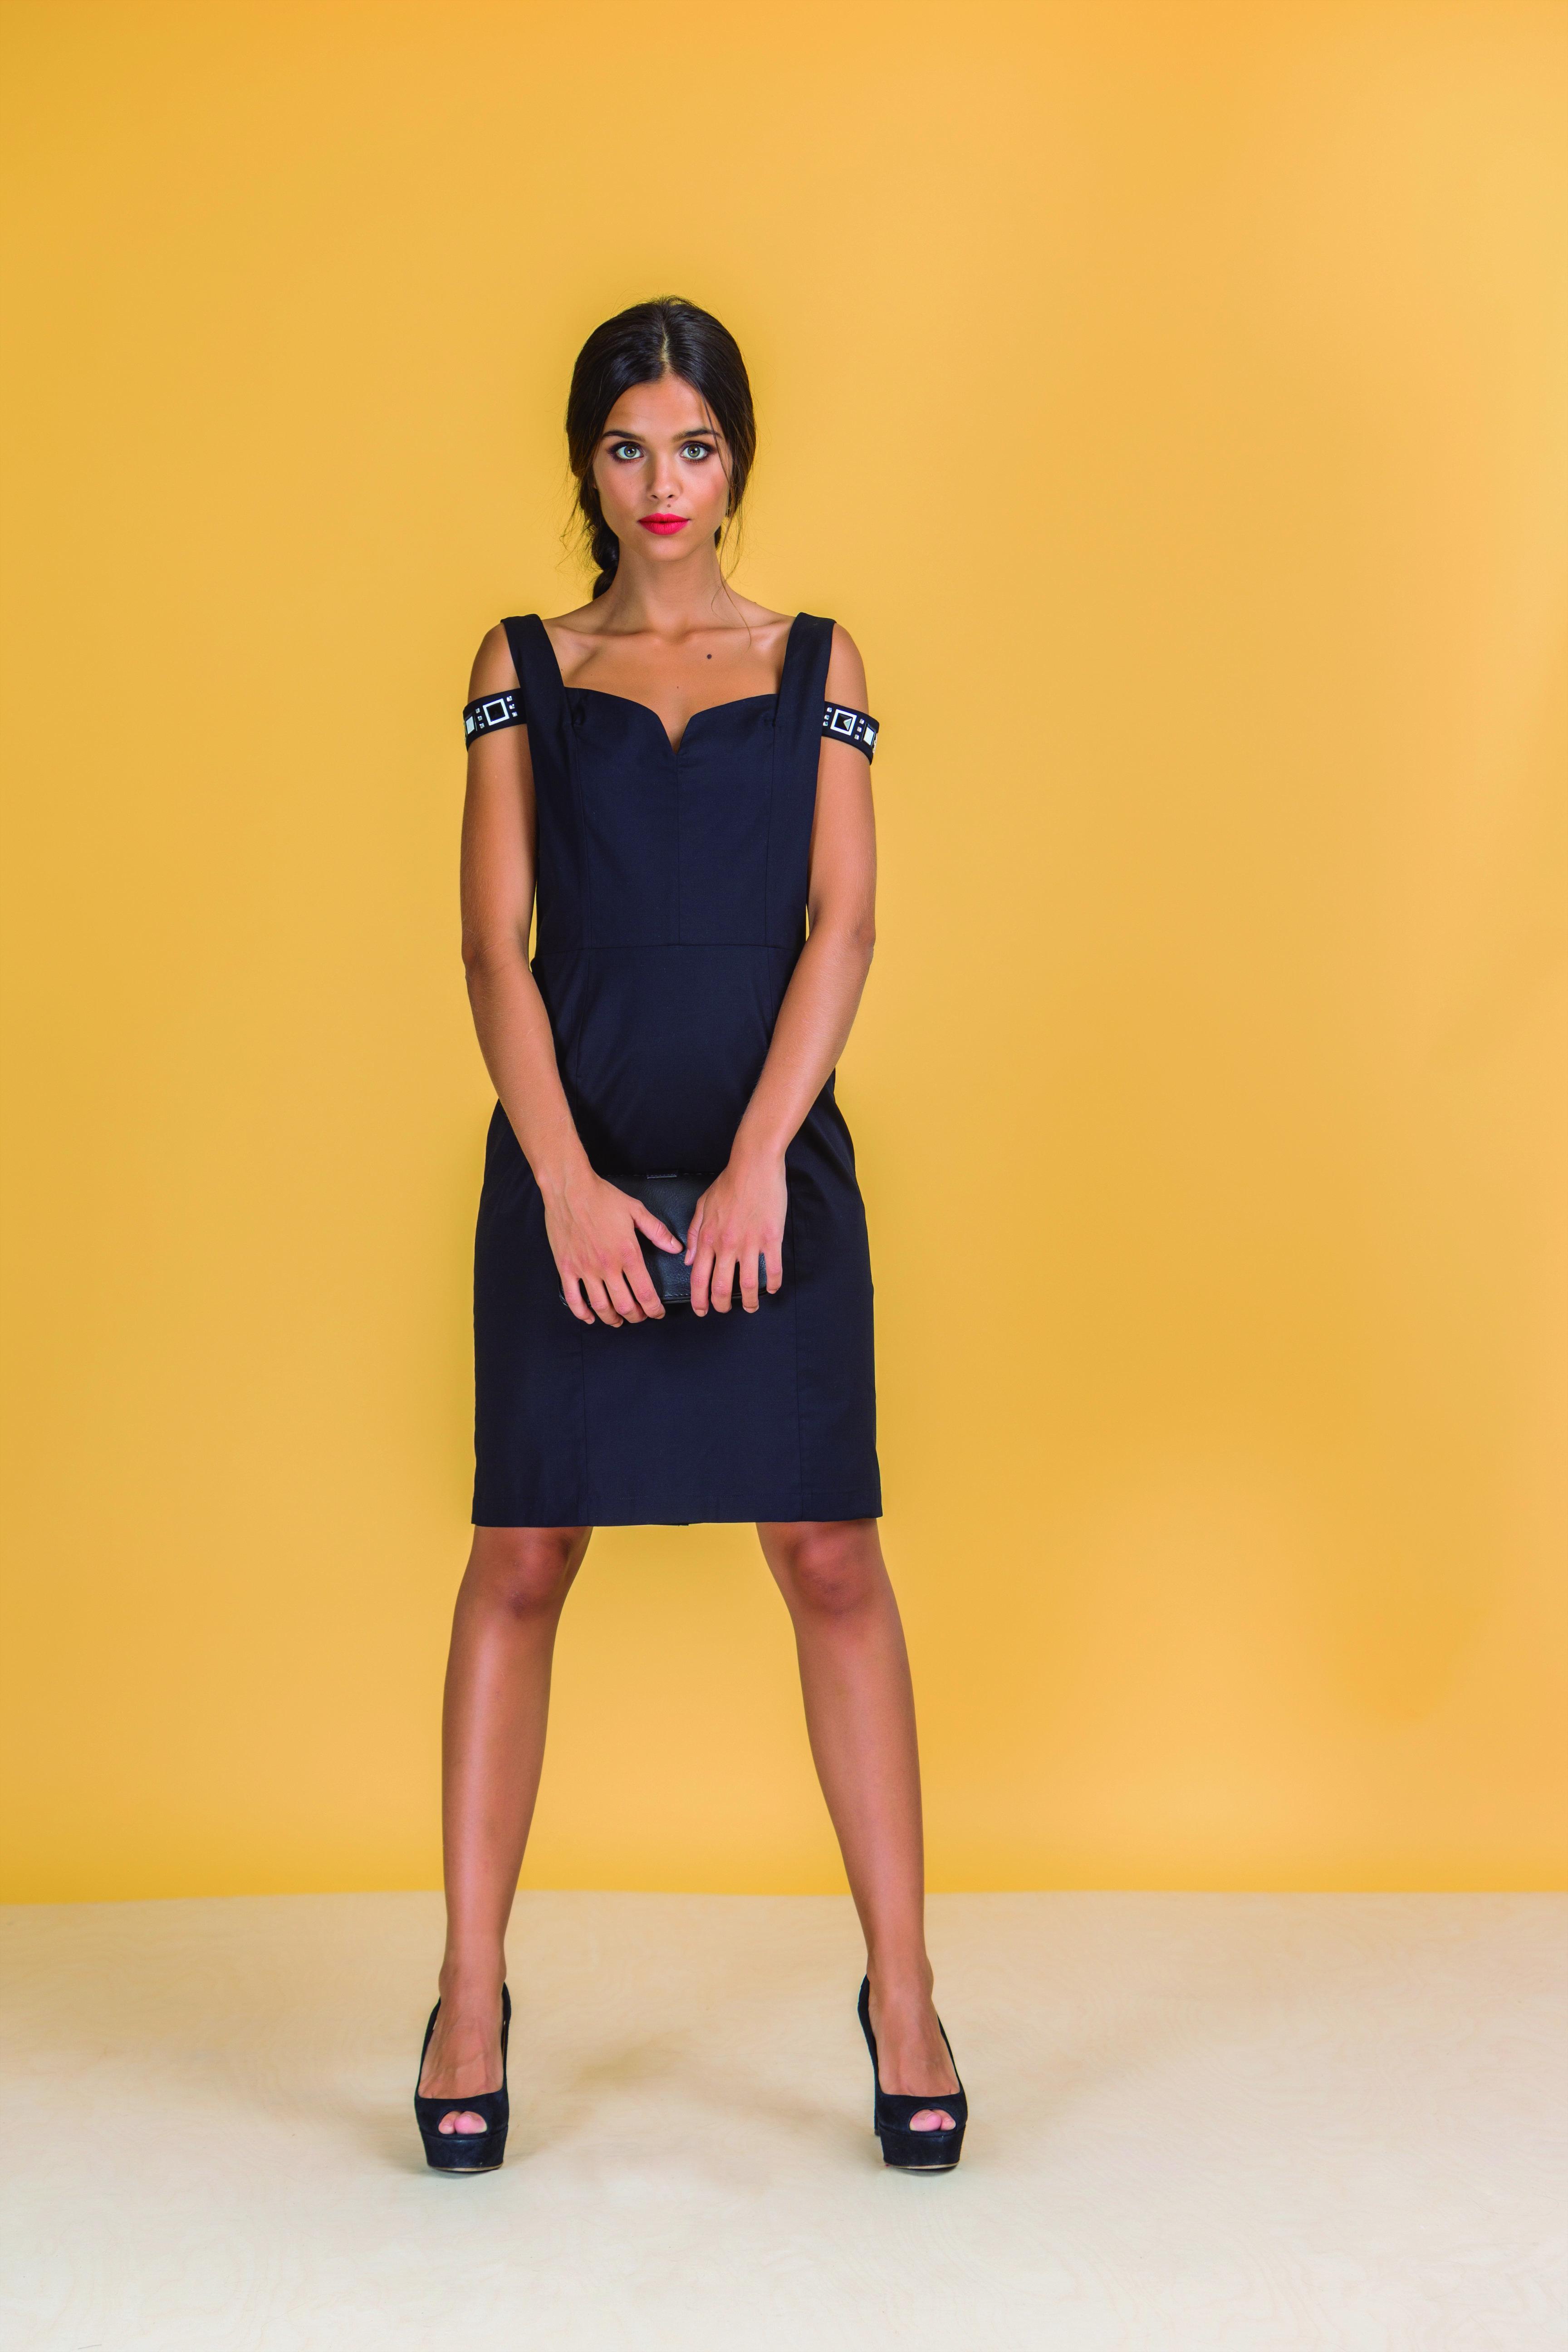 Paul Brial: Sweetheart Bodice Cut Out Shoulder Sexy Vixen Dress